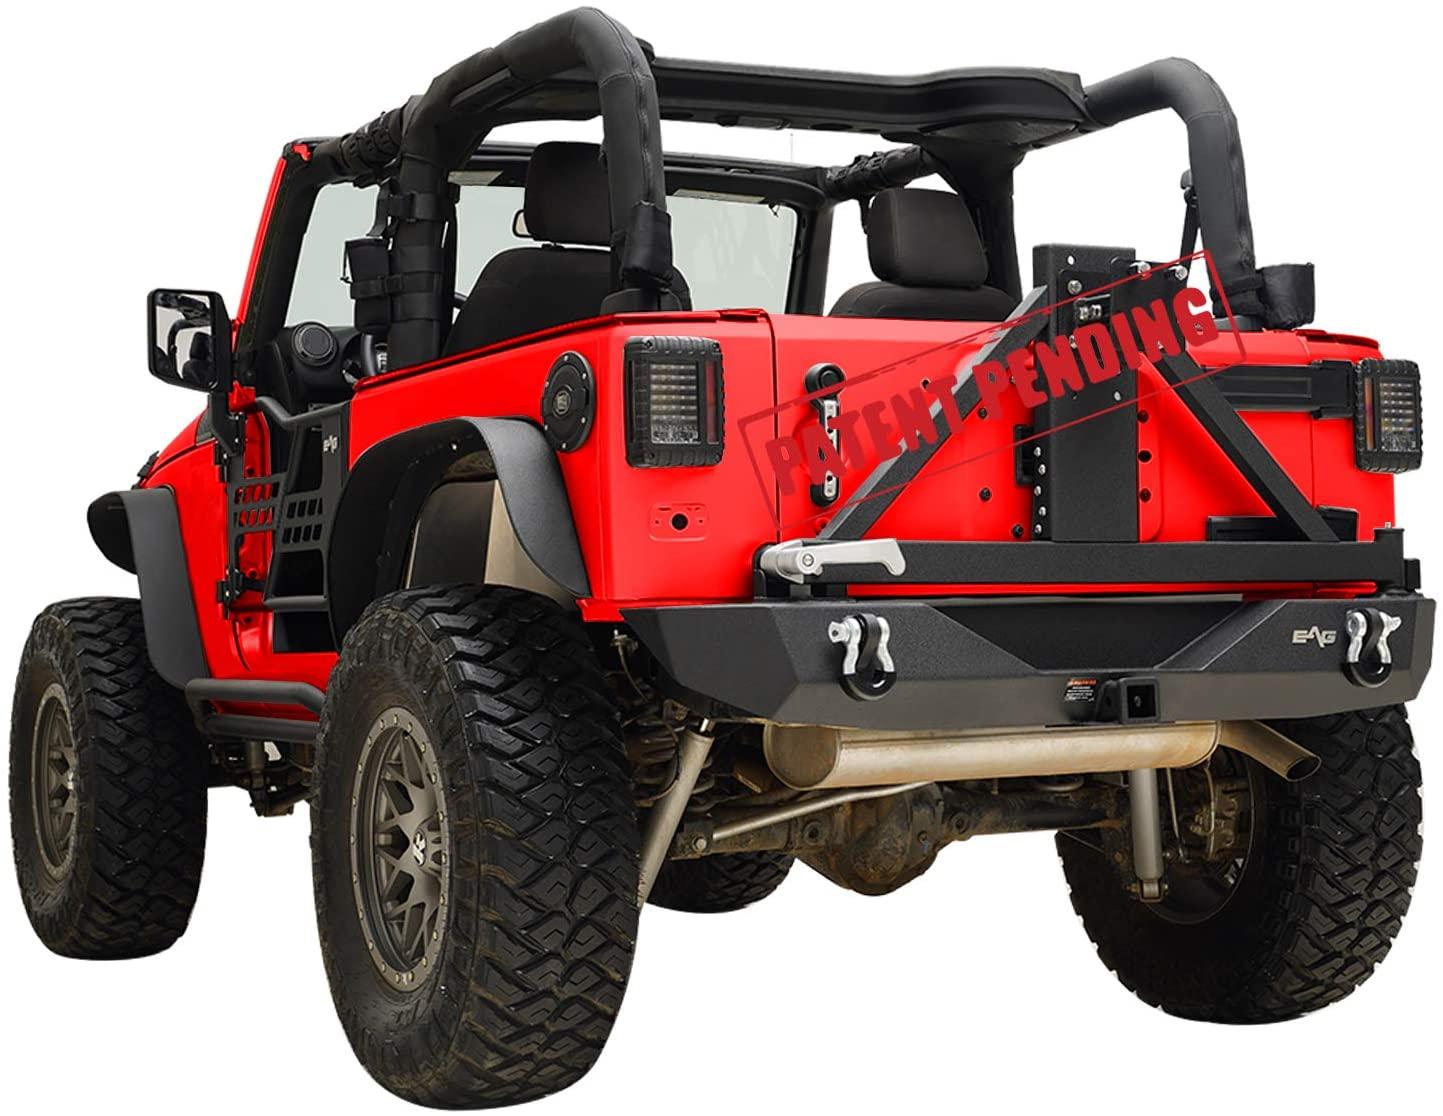 KML Rear Bumper with Assembled Tire Carrier Mount Fit for 07-18 Wrangler JK